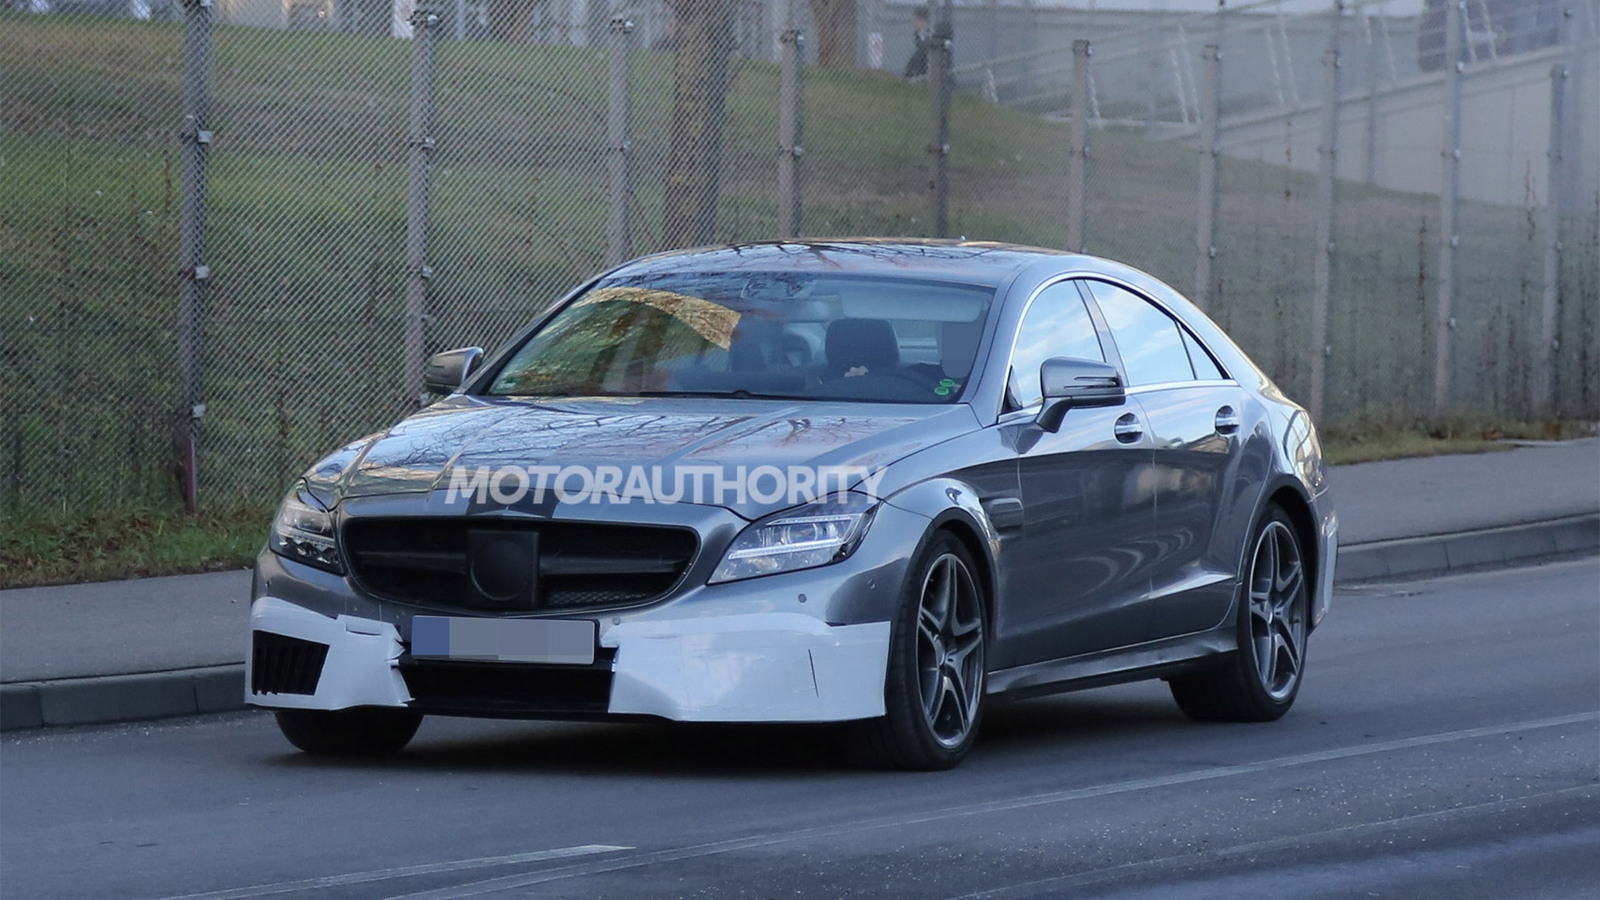 2015 Mercedes-Benz CLS63 AMG facelift spy shots